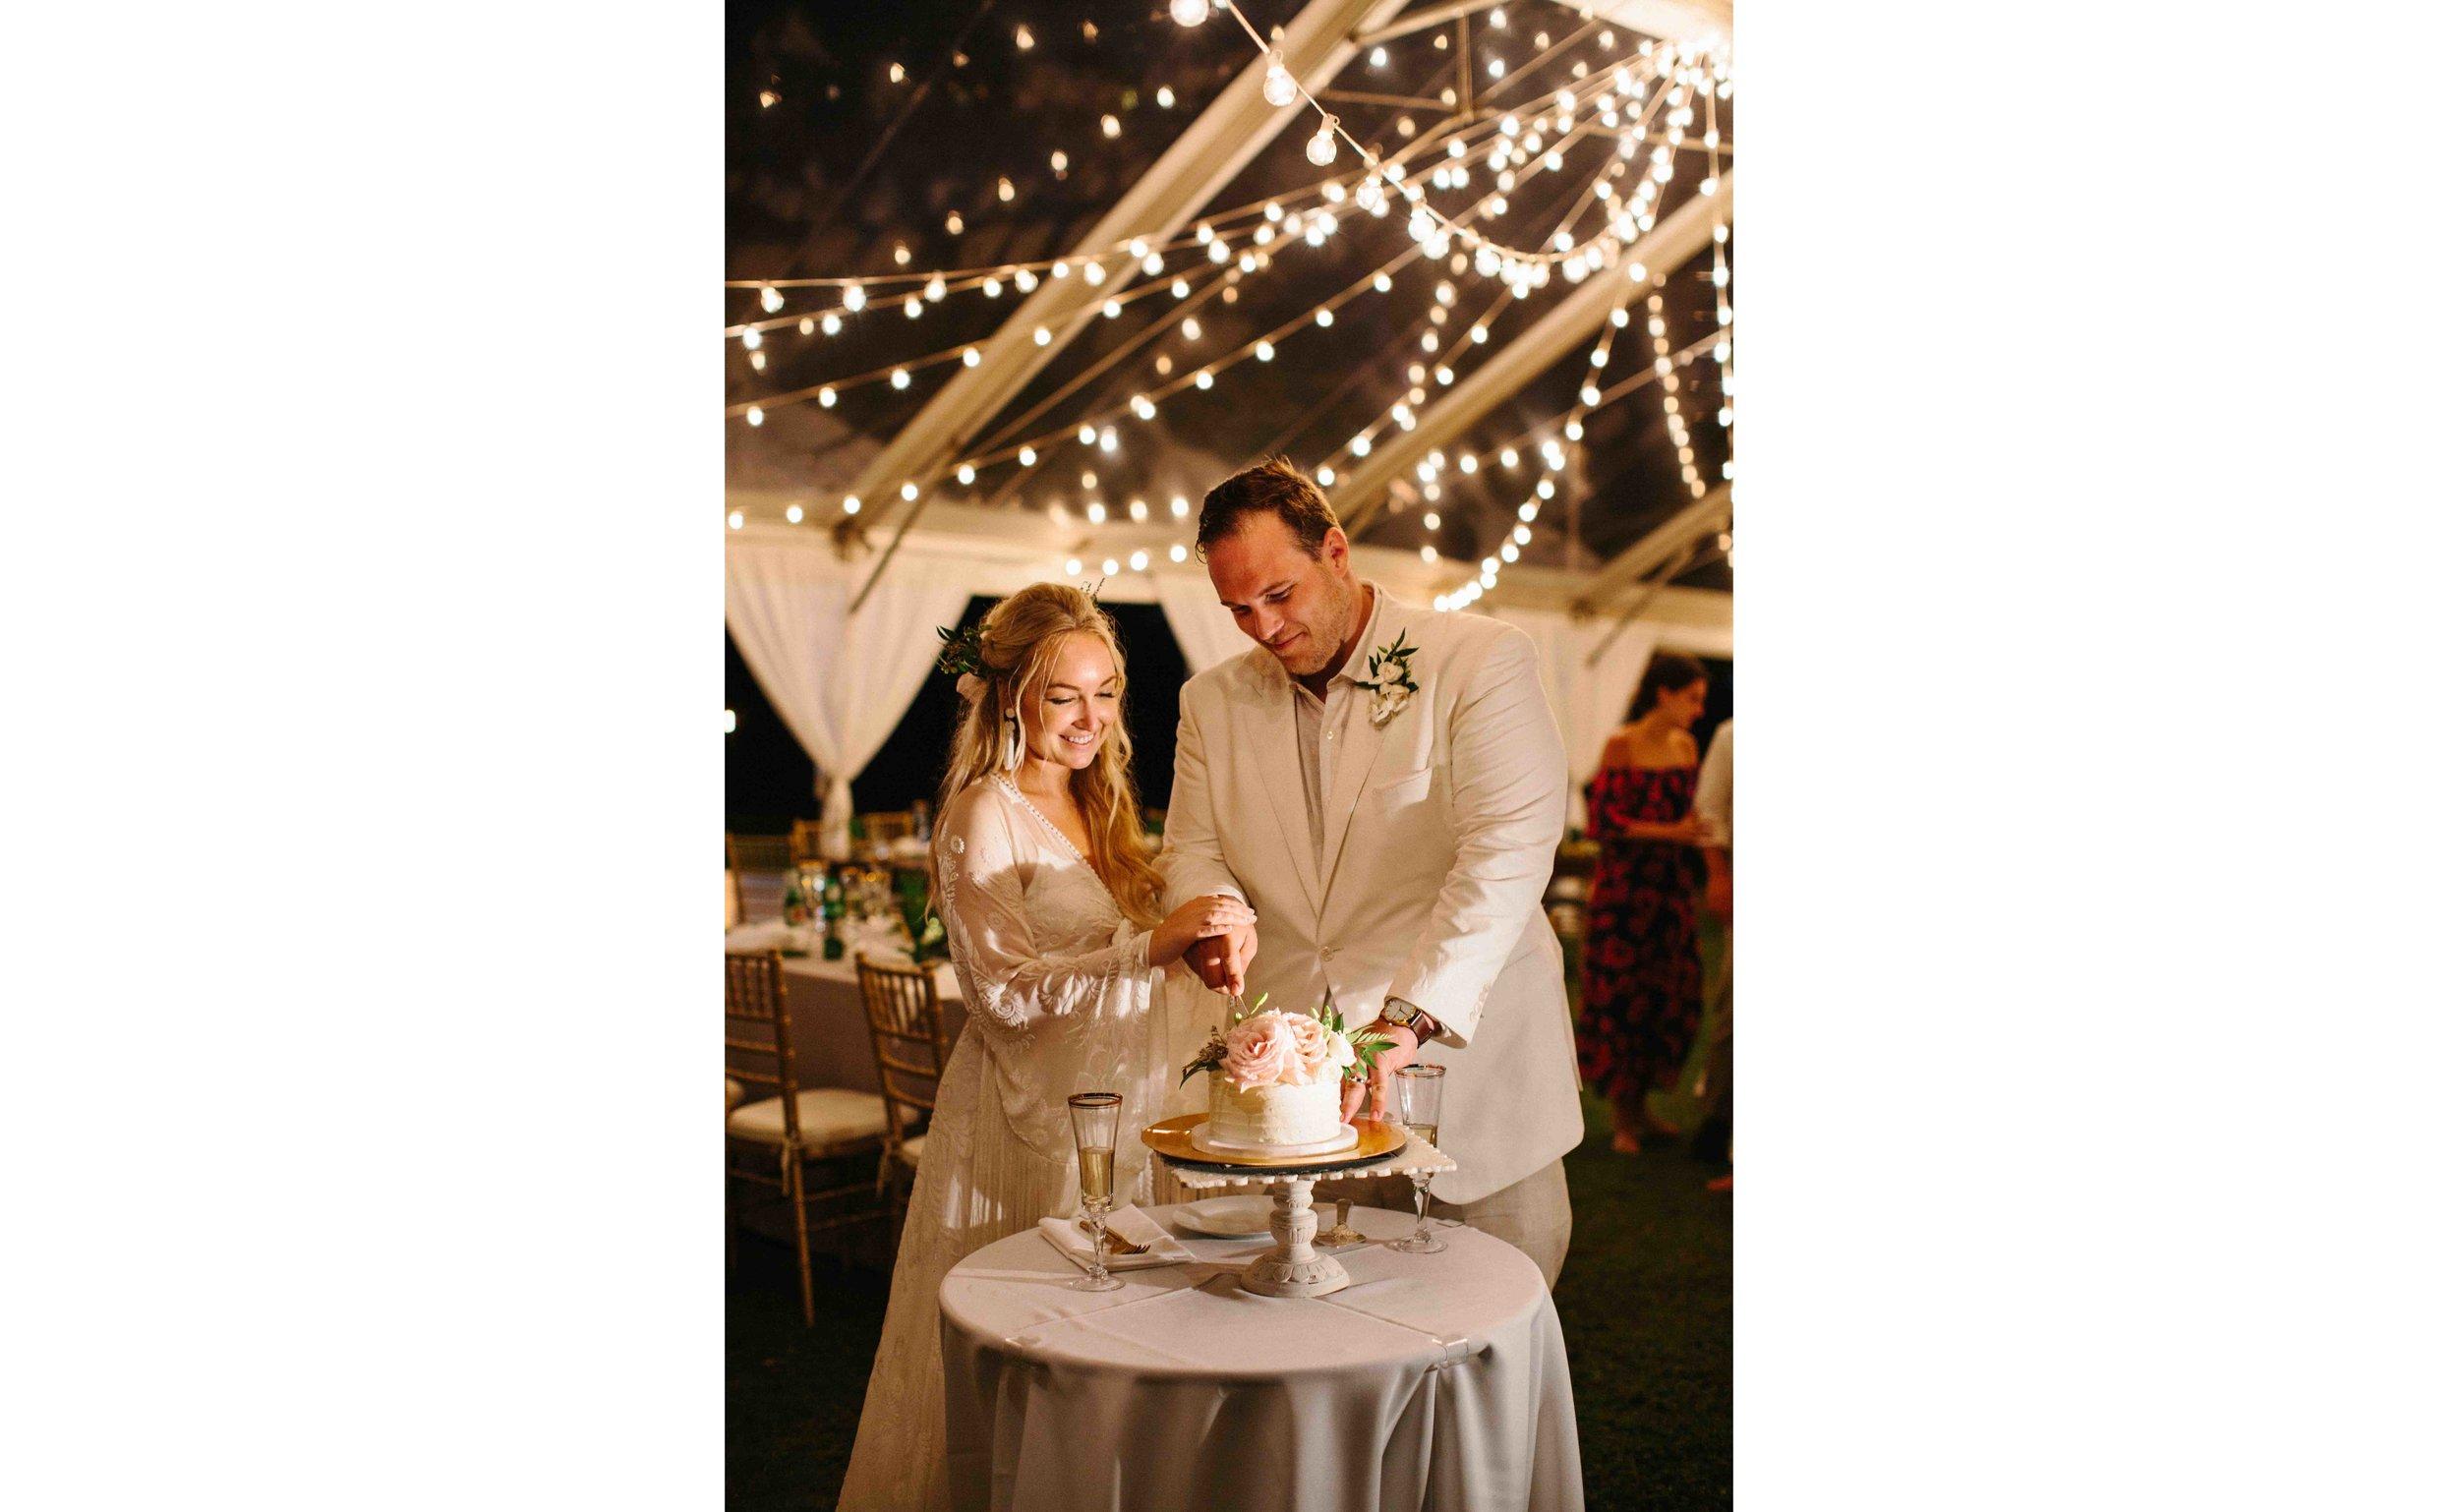 Oahu Wedding Photography of Cake Cutting